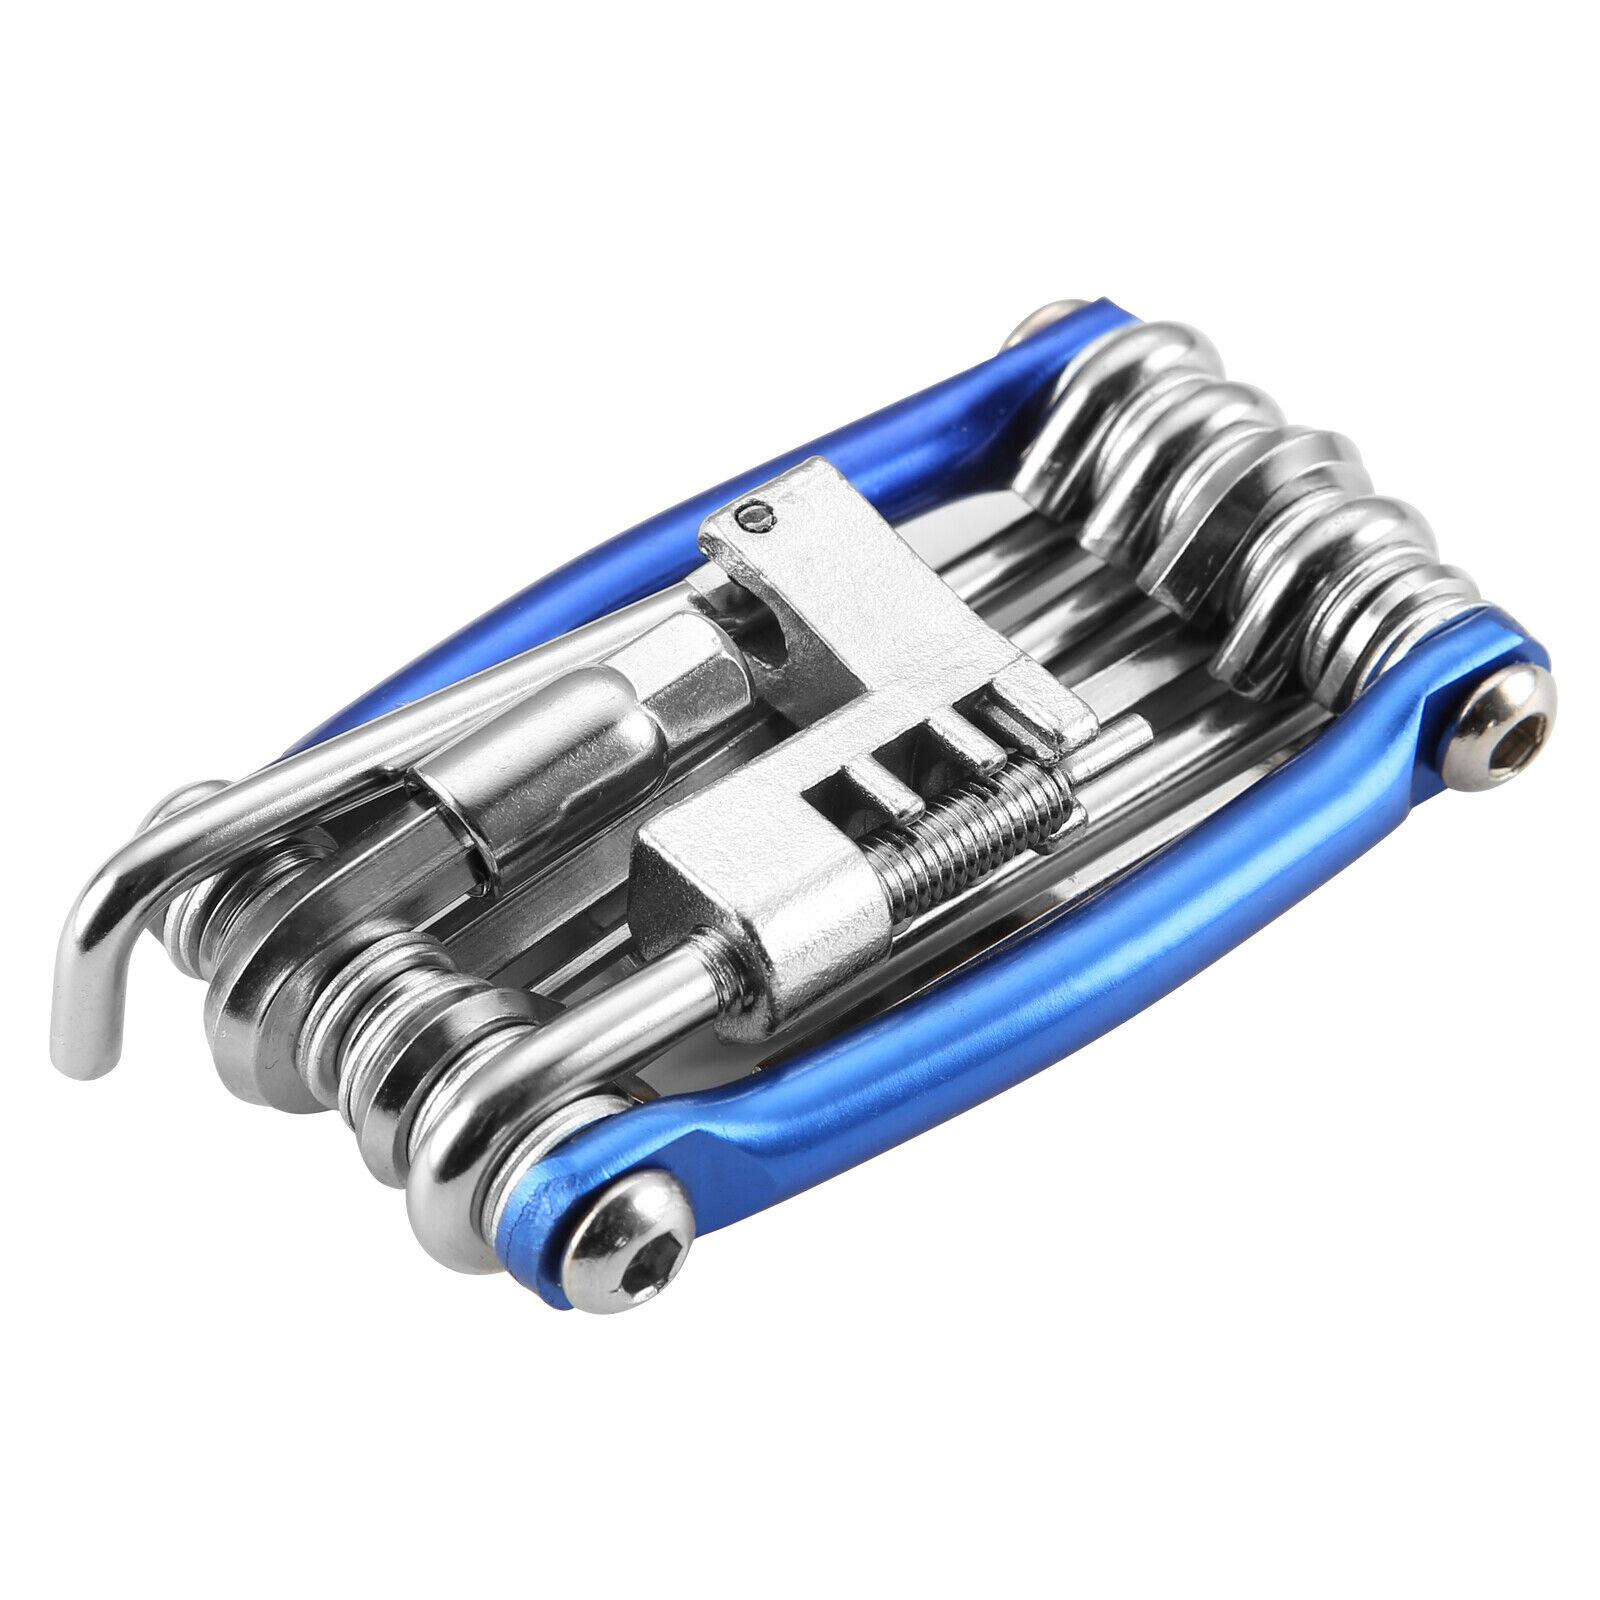 Multi Function Cycling Mountain Bike Tool Chain Breaker MTB Bicycle Repair Tools